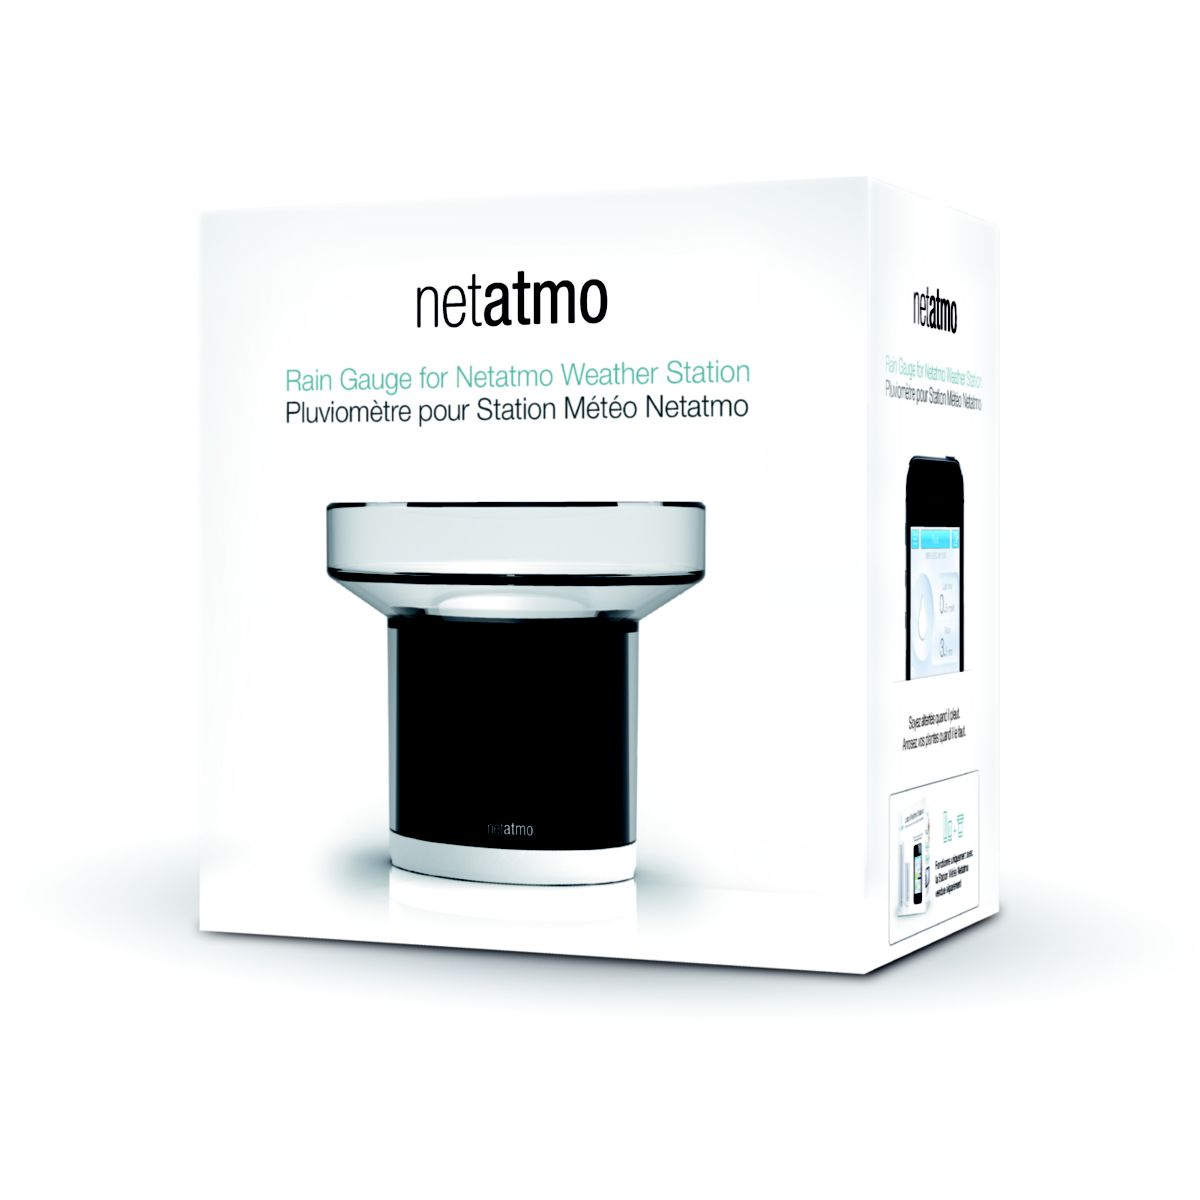 Pluviom�tre connect� netatmo pluviom�tre pour station m�t�o - livraison offerte : code premium (photo)